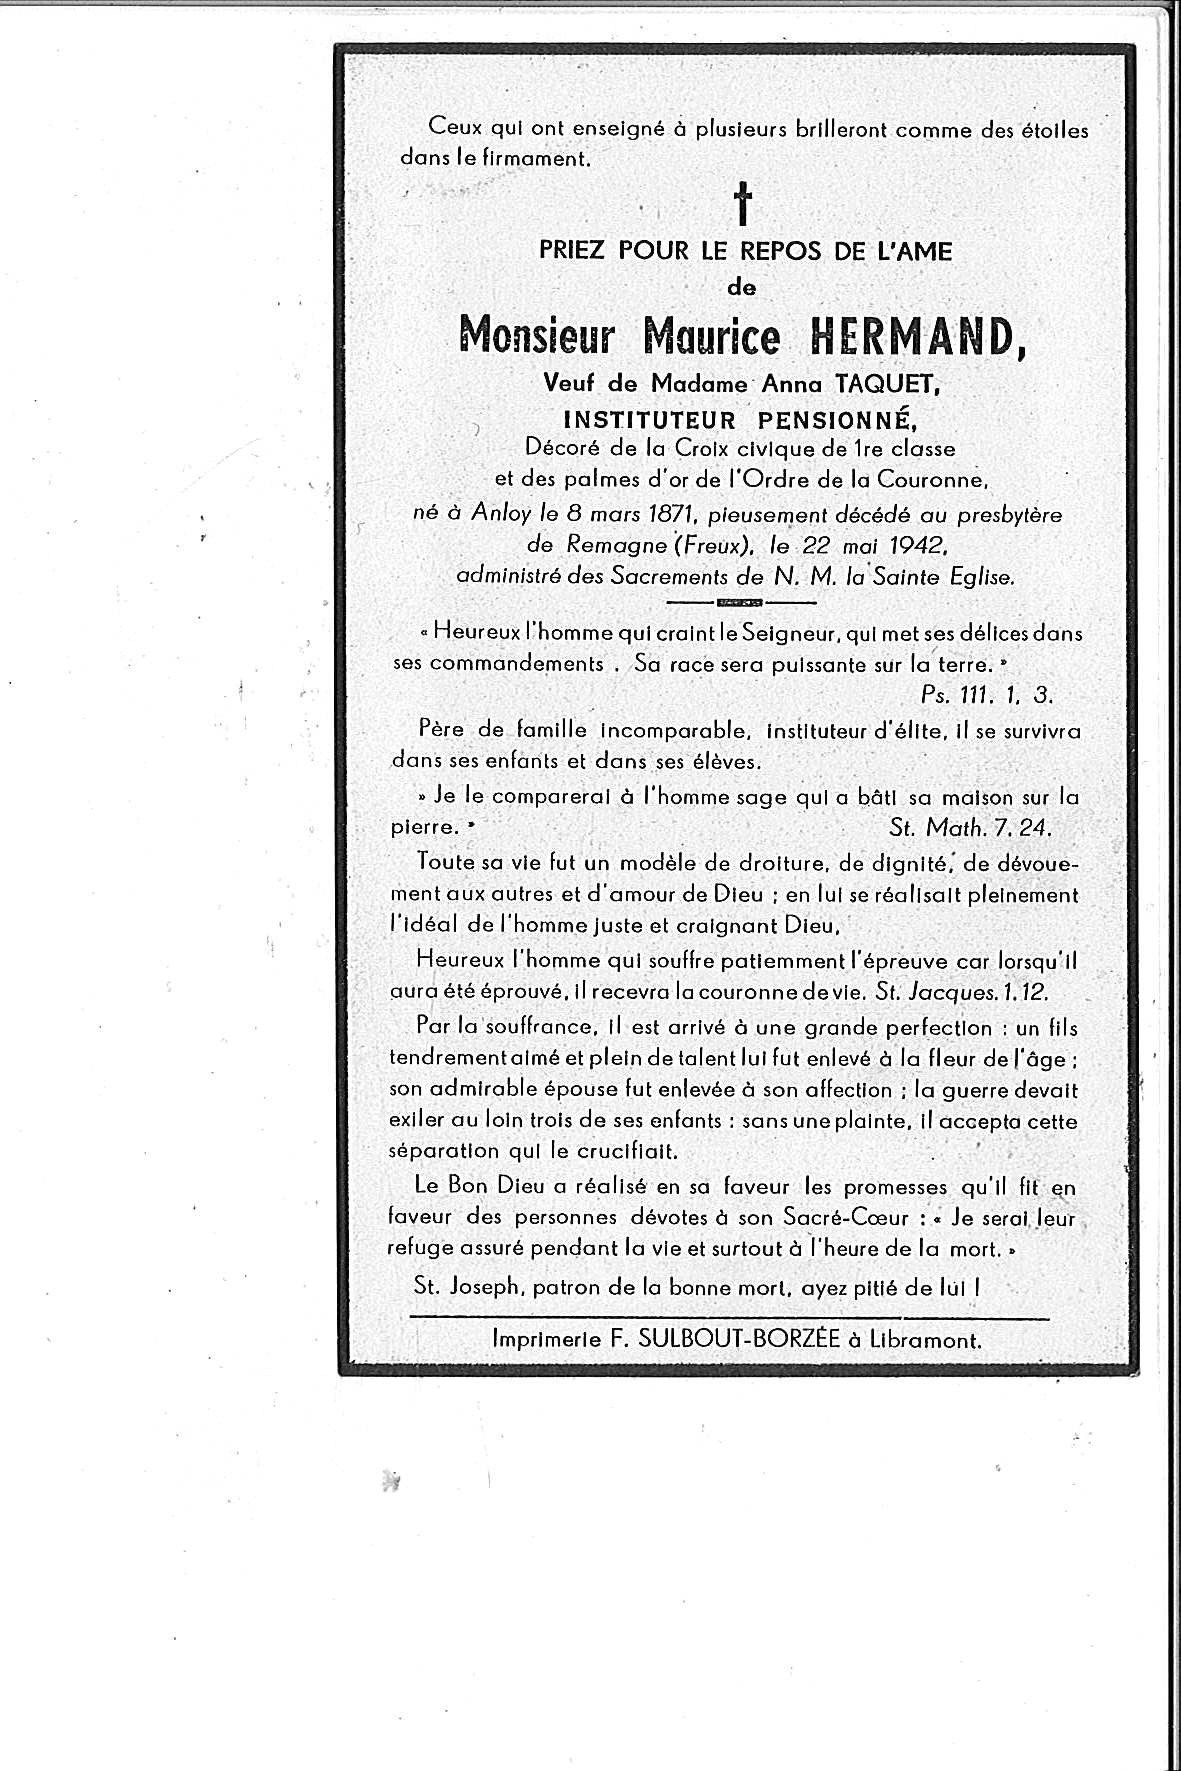 Maurice(1942)20150311141146_00016.jpg